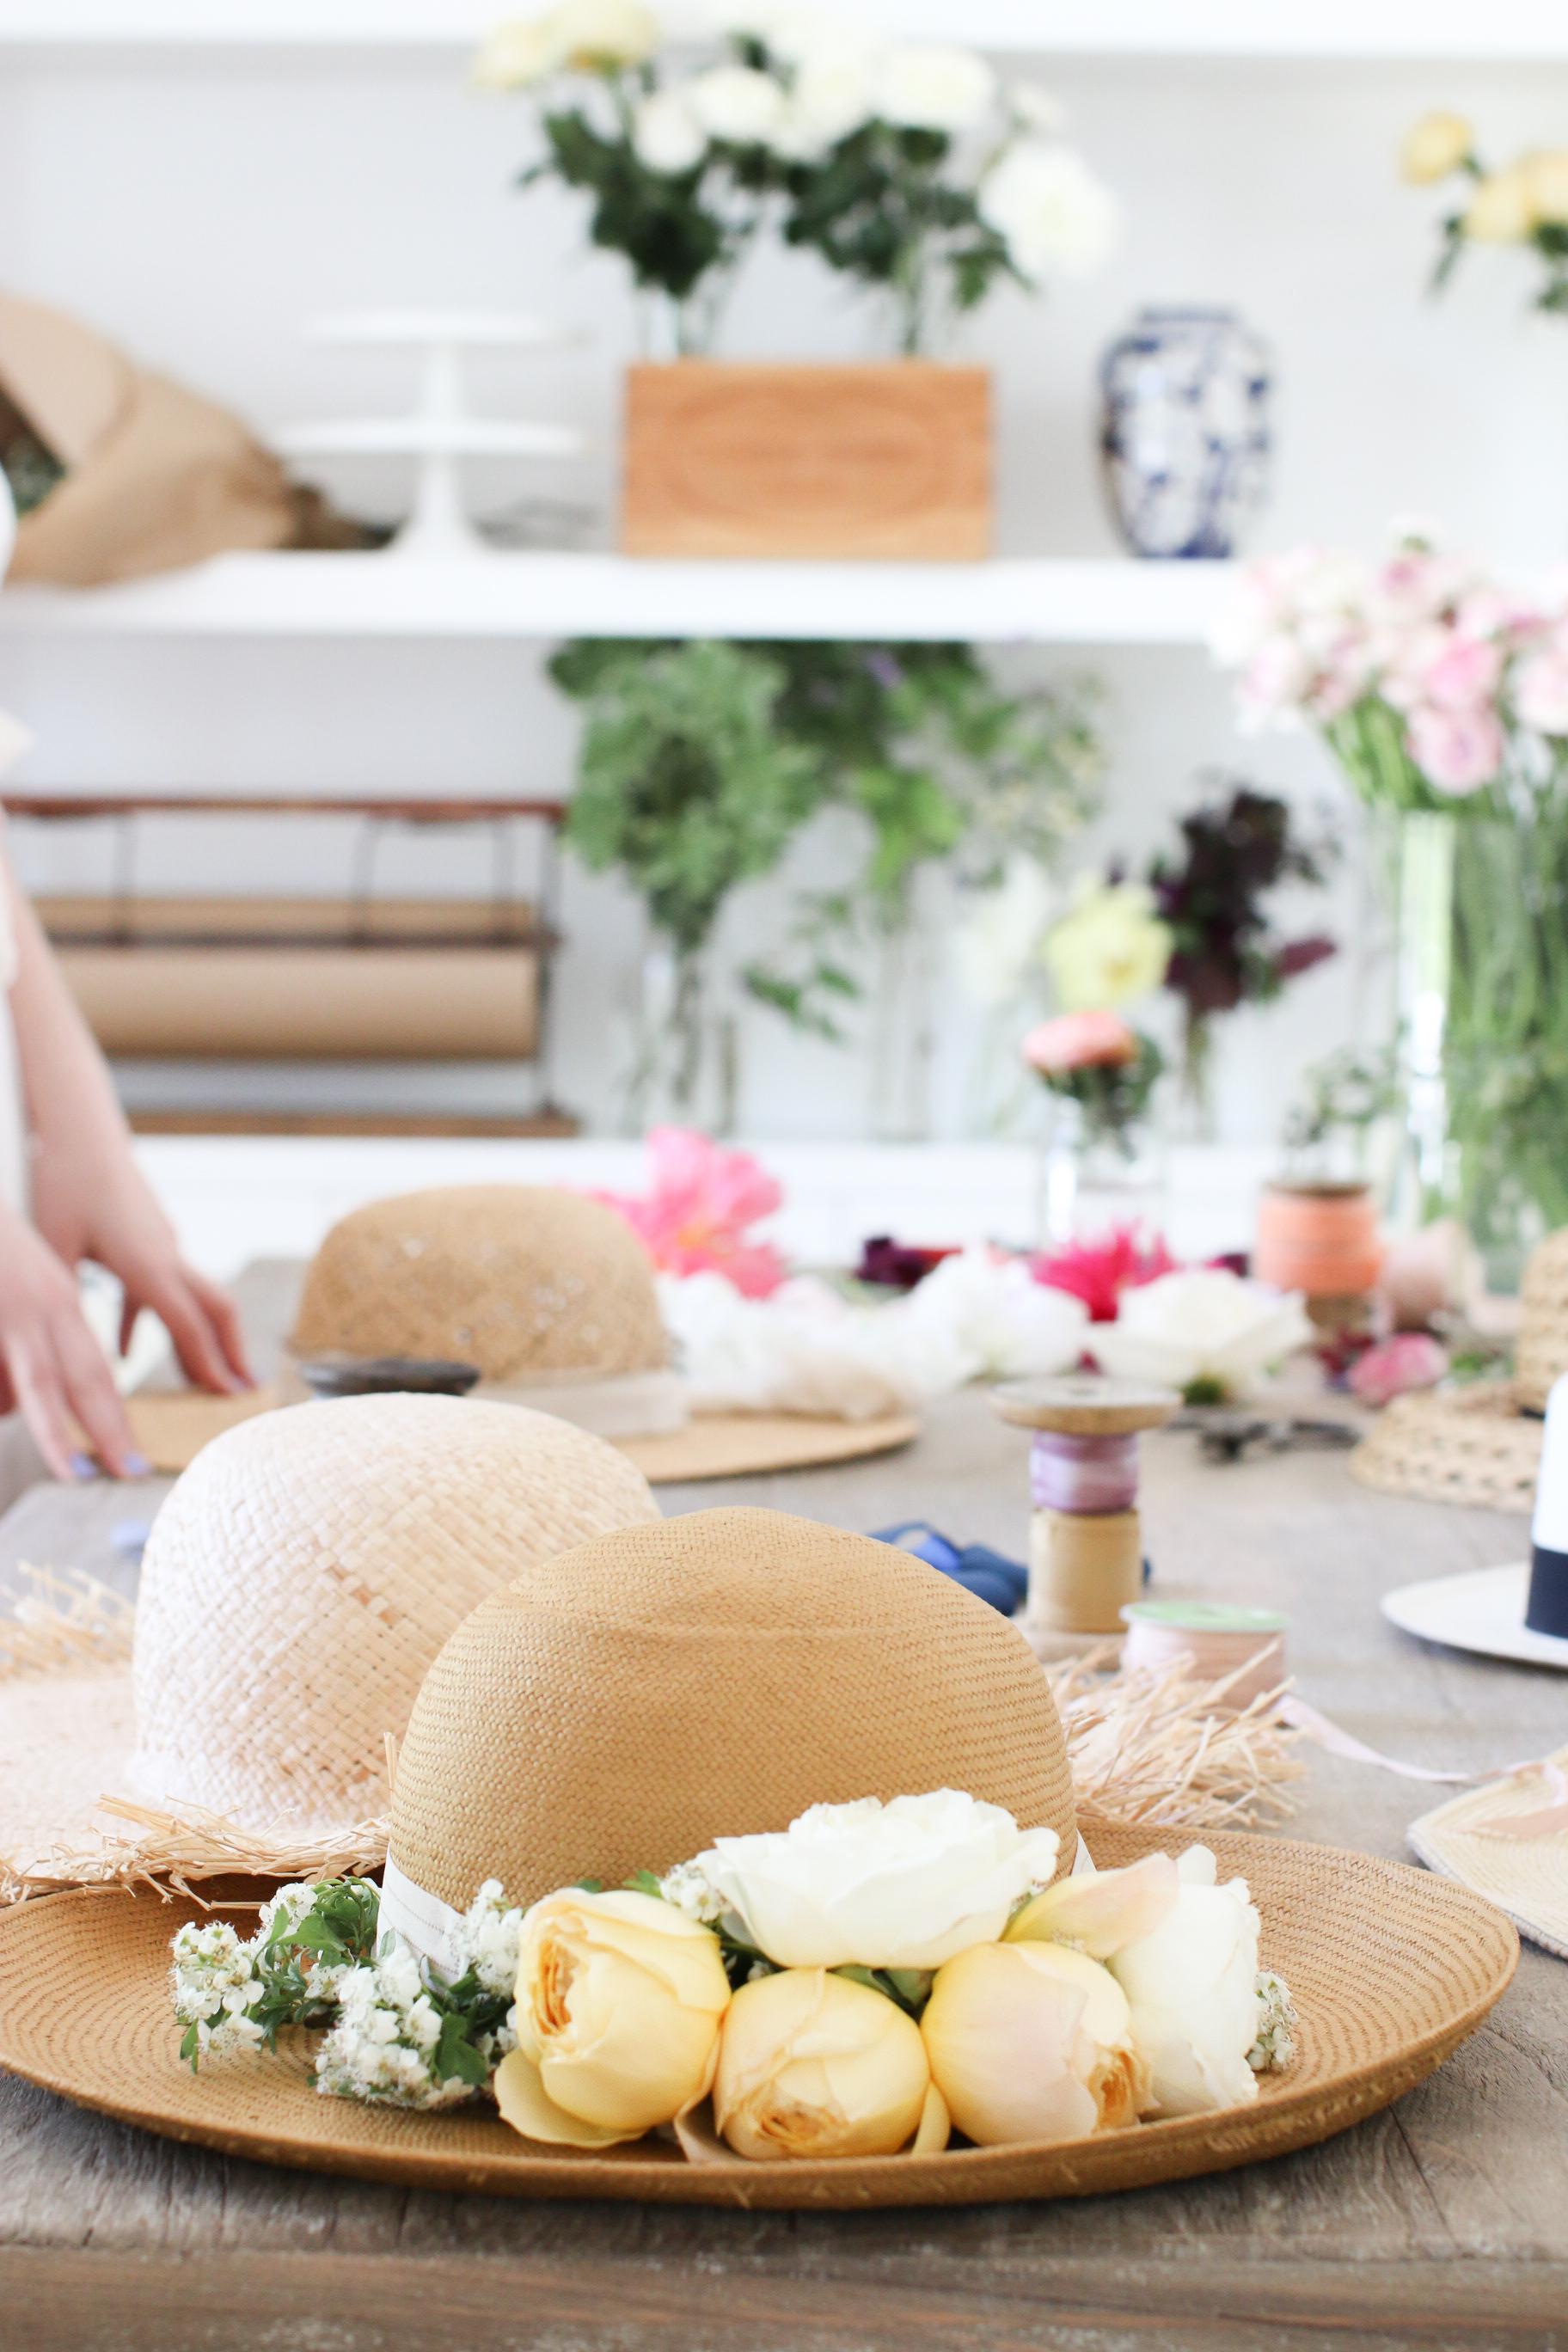 DIY Floral Hat Mother's day Monika Hibbs